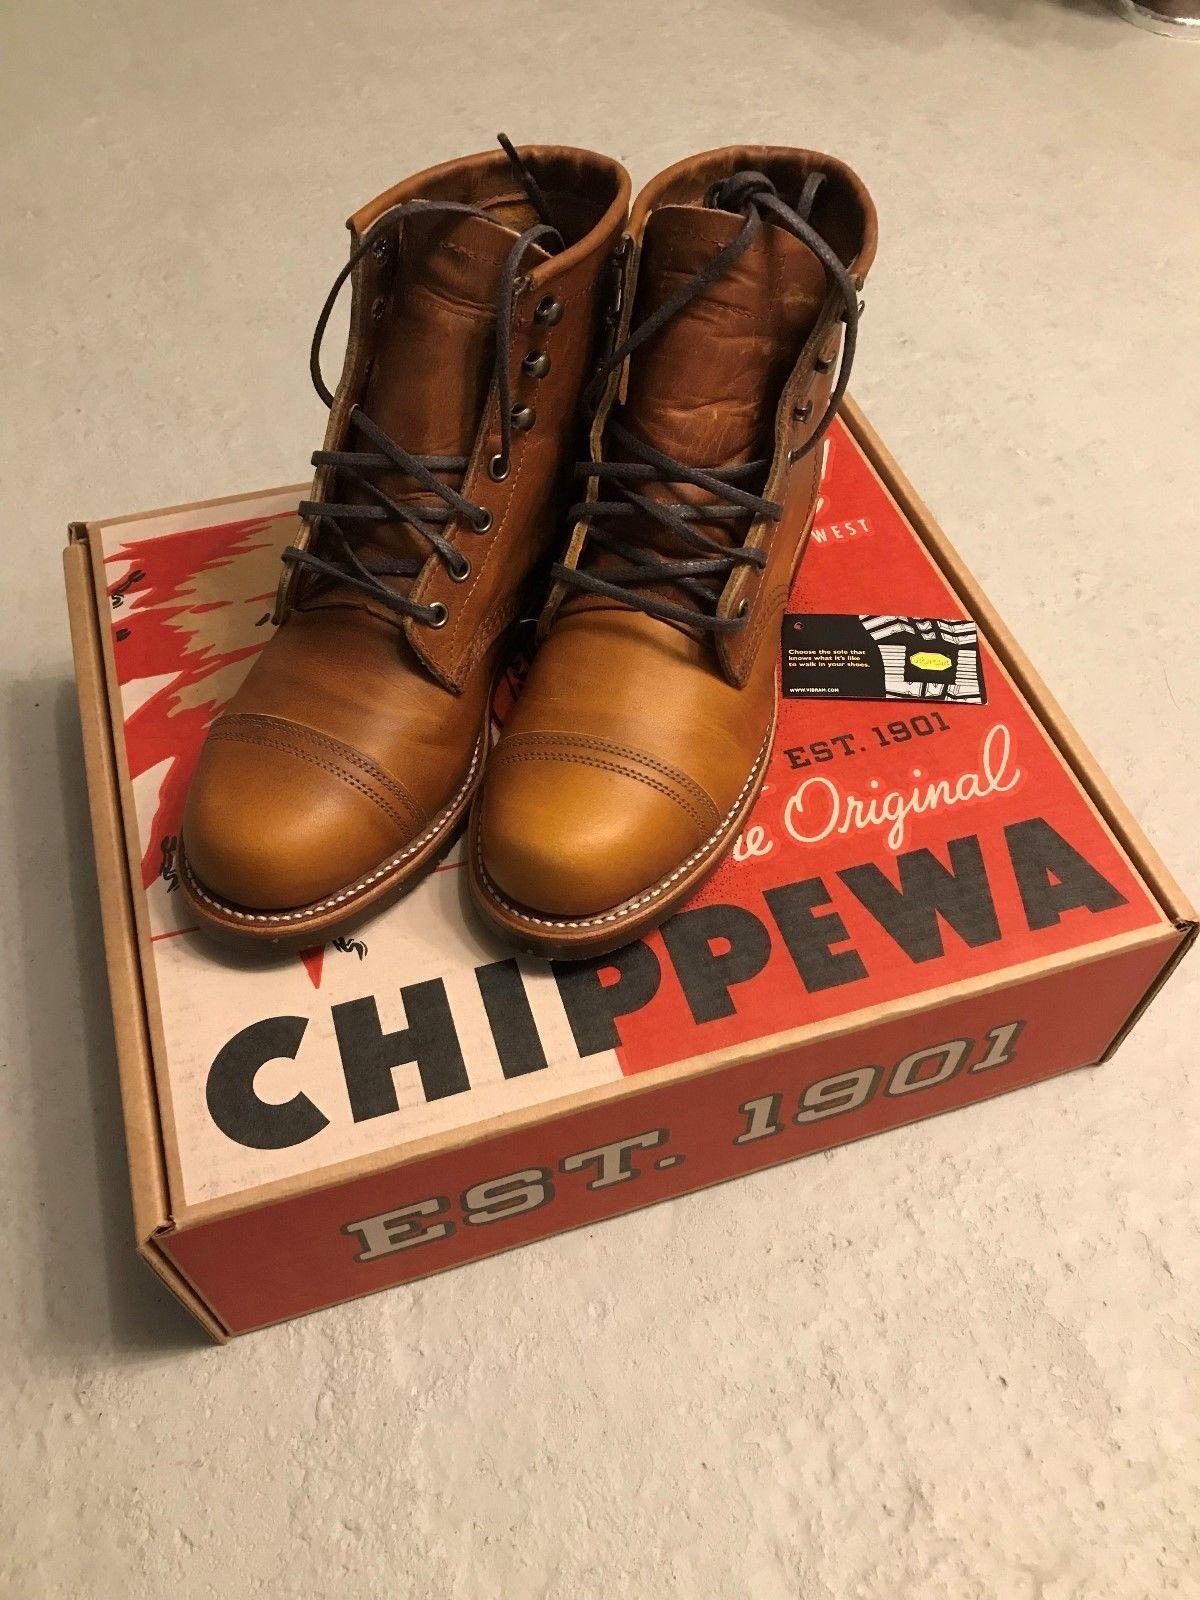 Chippewa Boots 6 Renegade Homestead 1901G47 Tan Herren